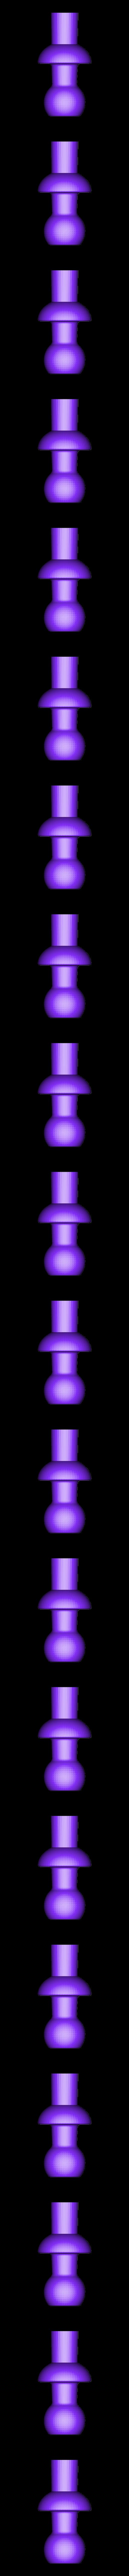 mini_tentacles_top.STL Download free STL file Mini Tentacles • 3D print model, OgoSport